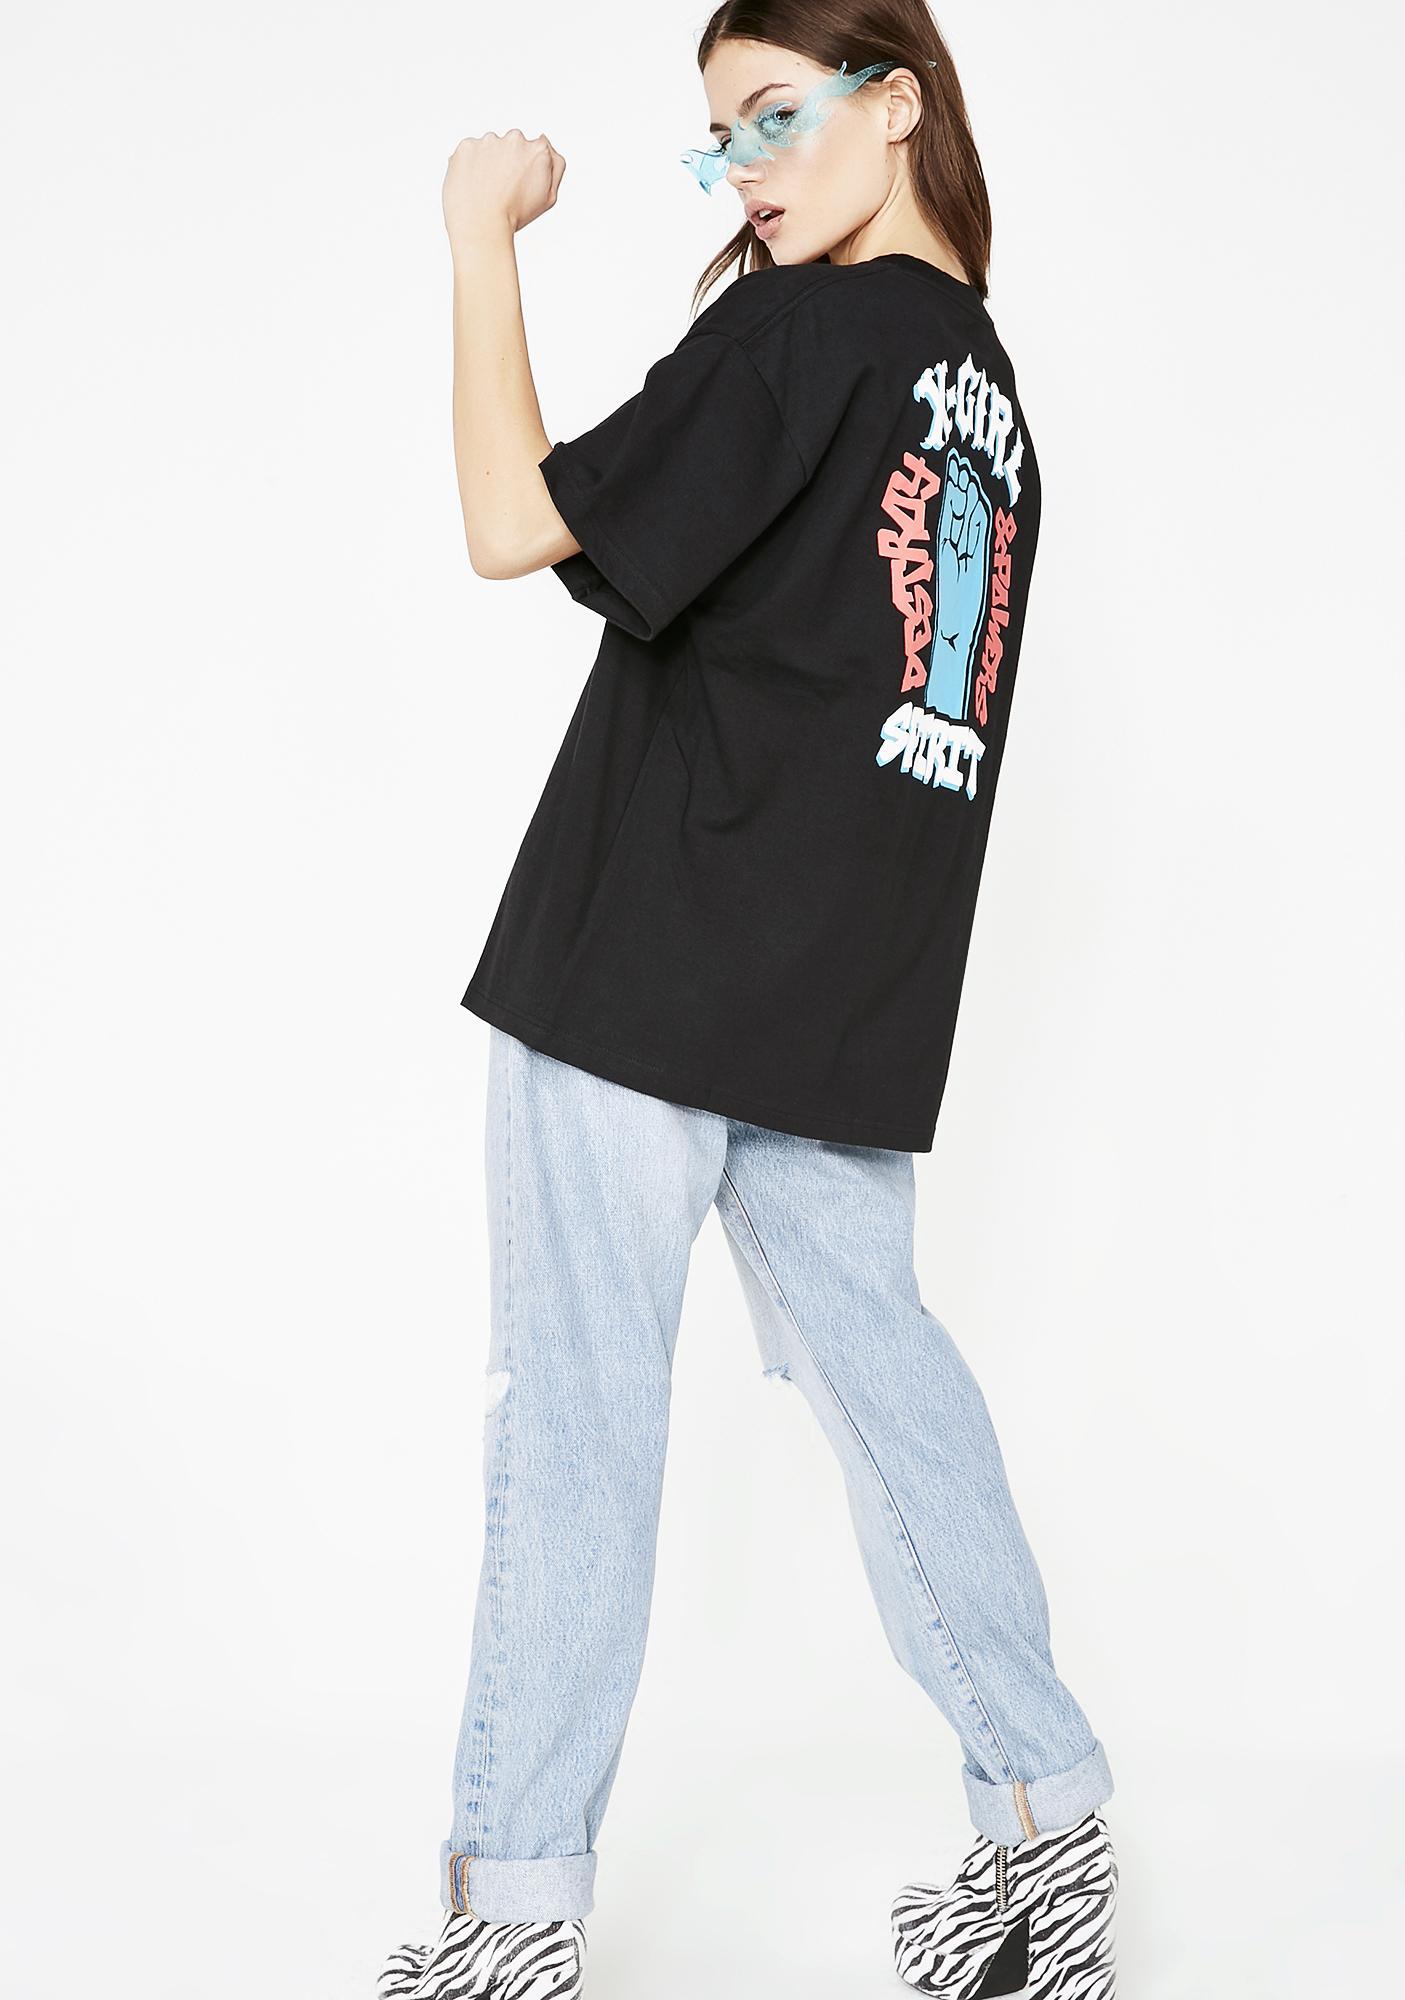 x-Girl Fist Short Sleeve Tee